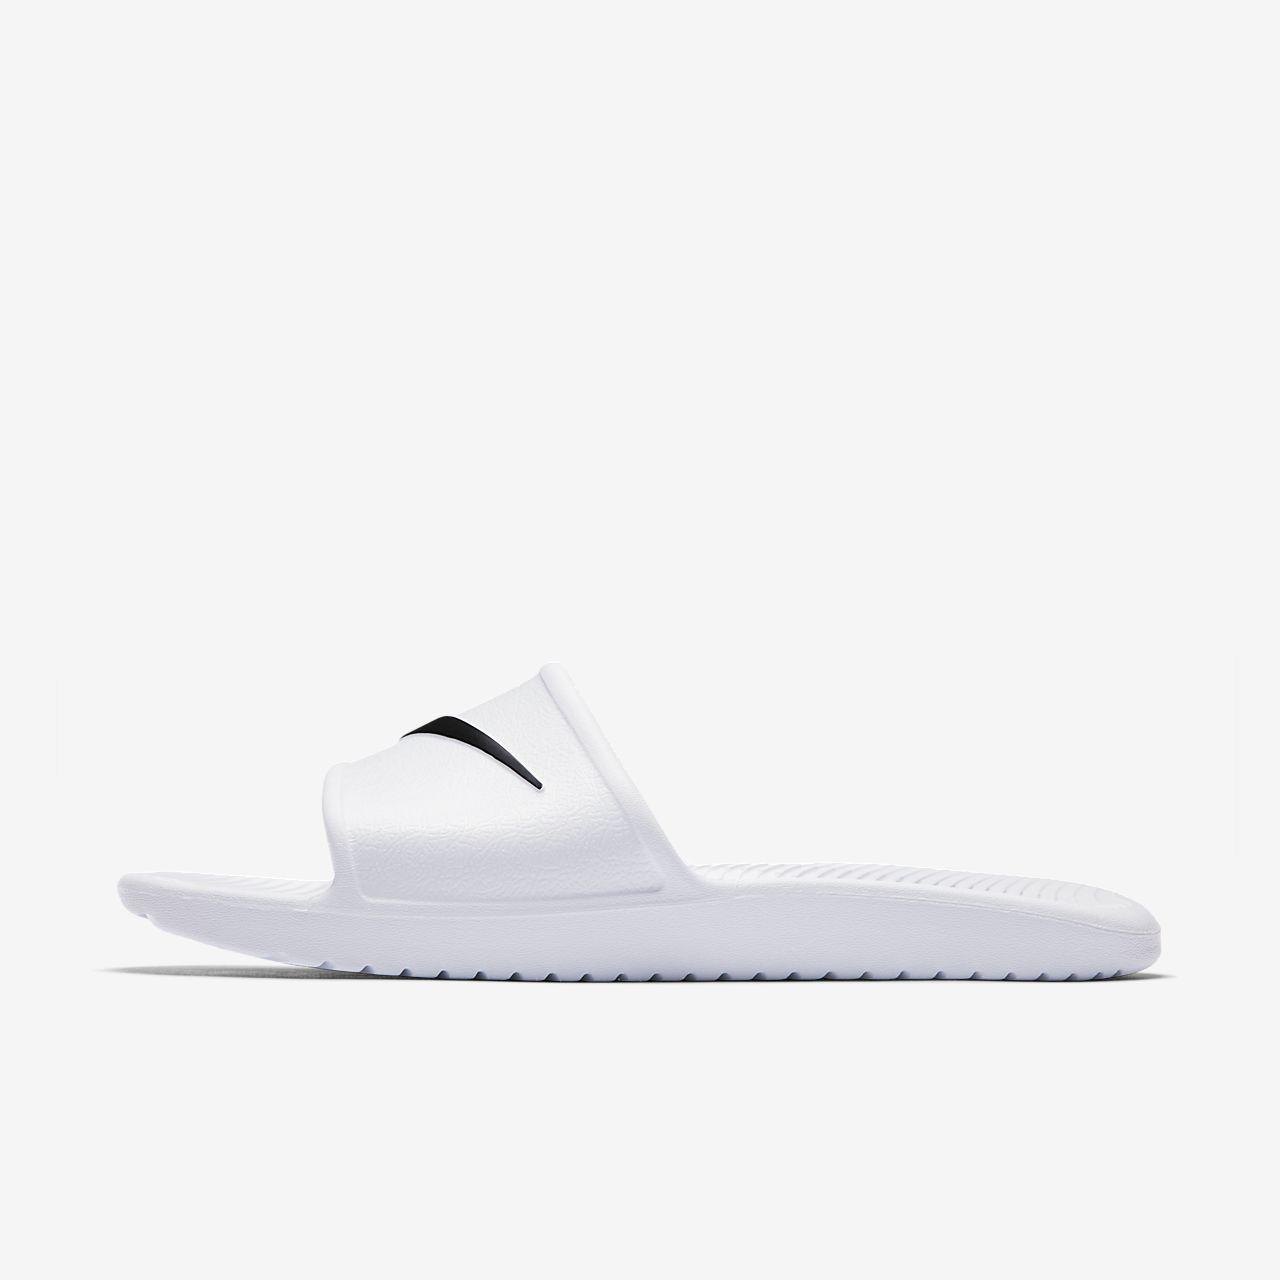 Nike Kawa Shower Xancletes - Dona